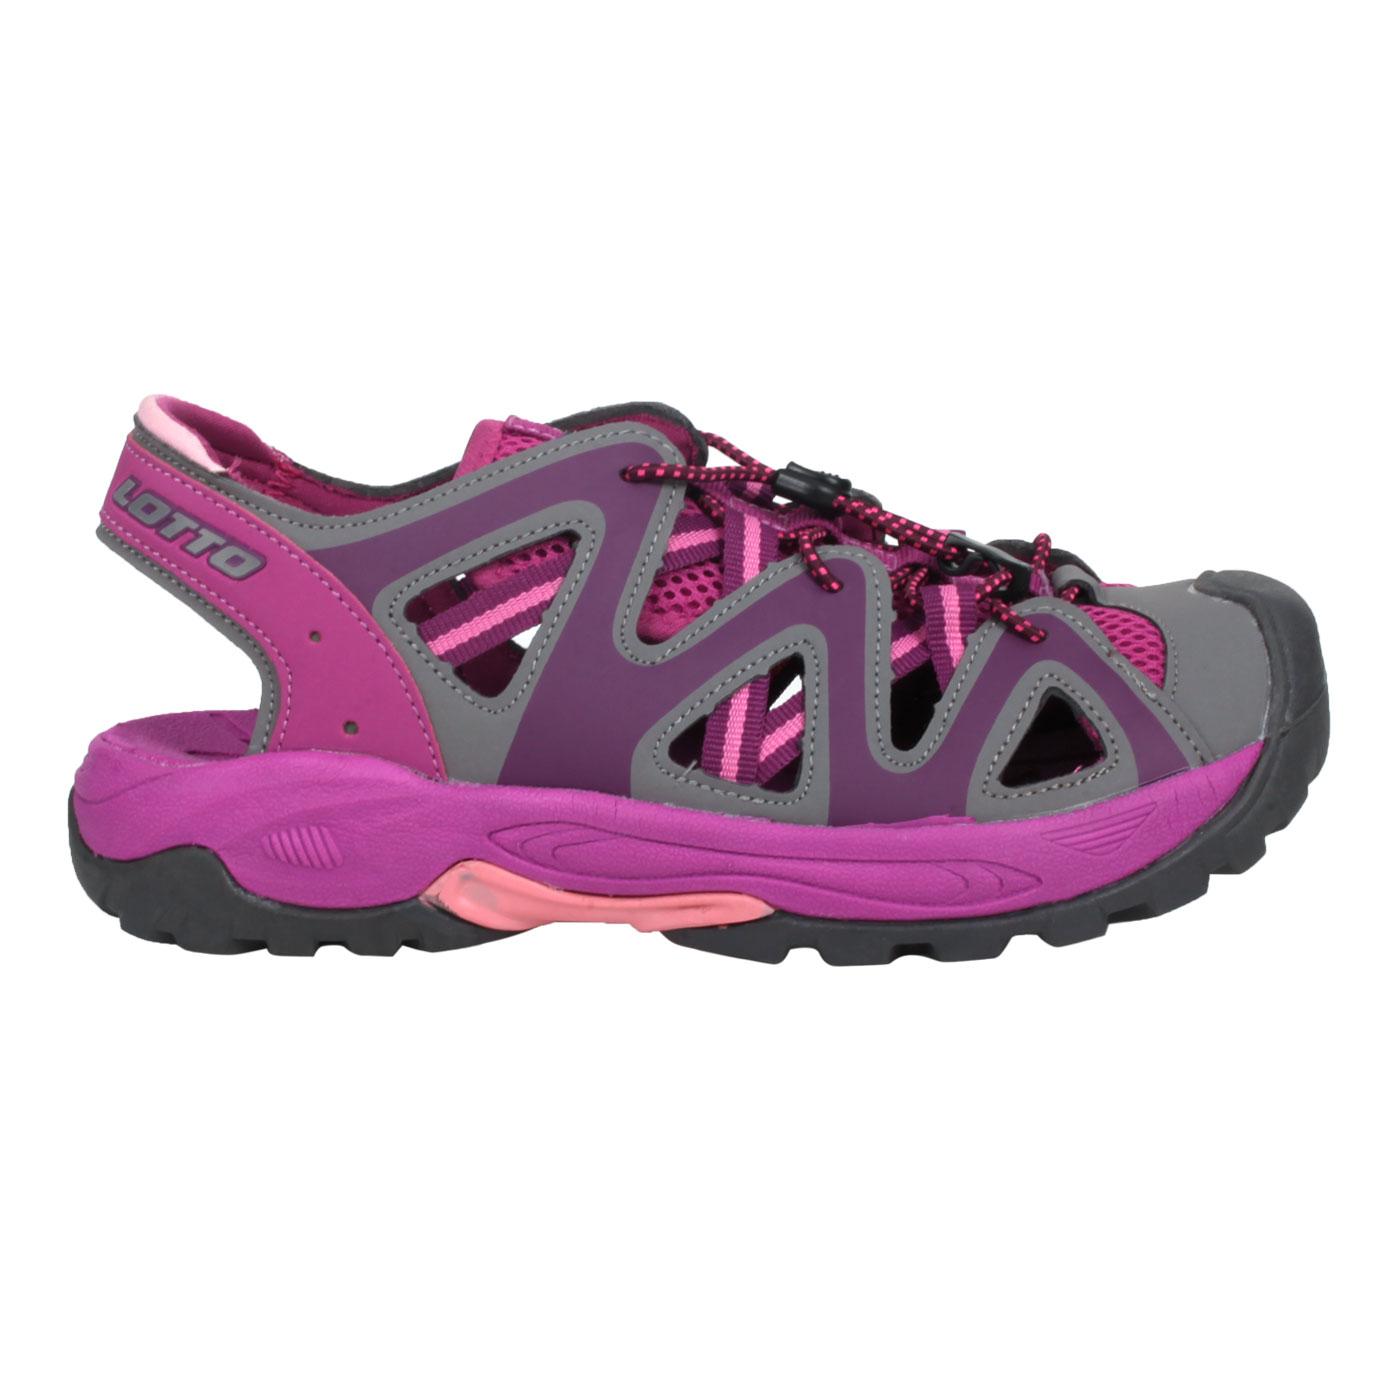 LOTTO 排水護趾涼鞋 LT1AWS3257 - 灰紫